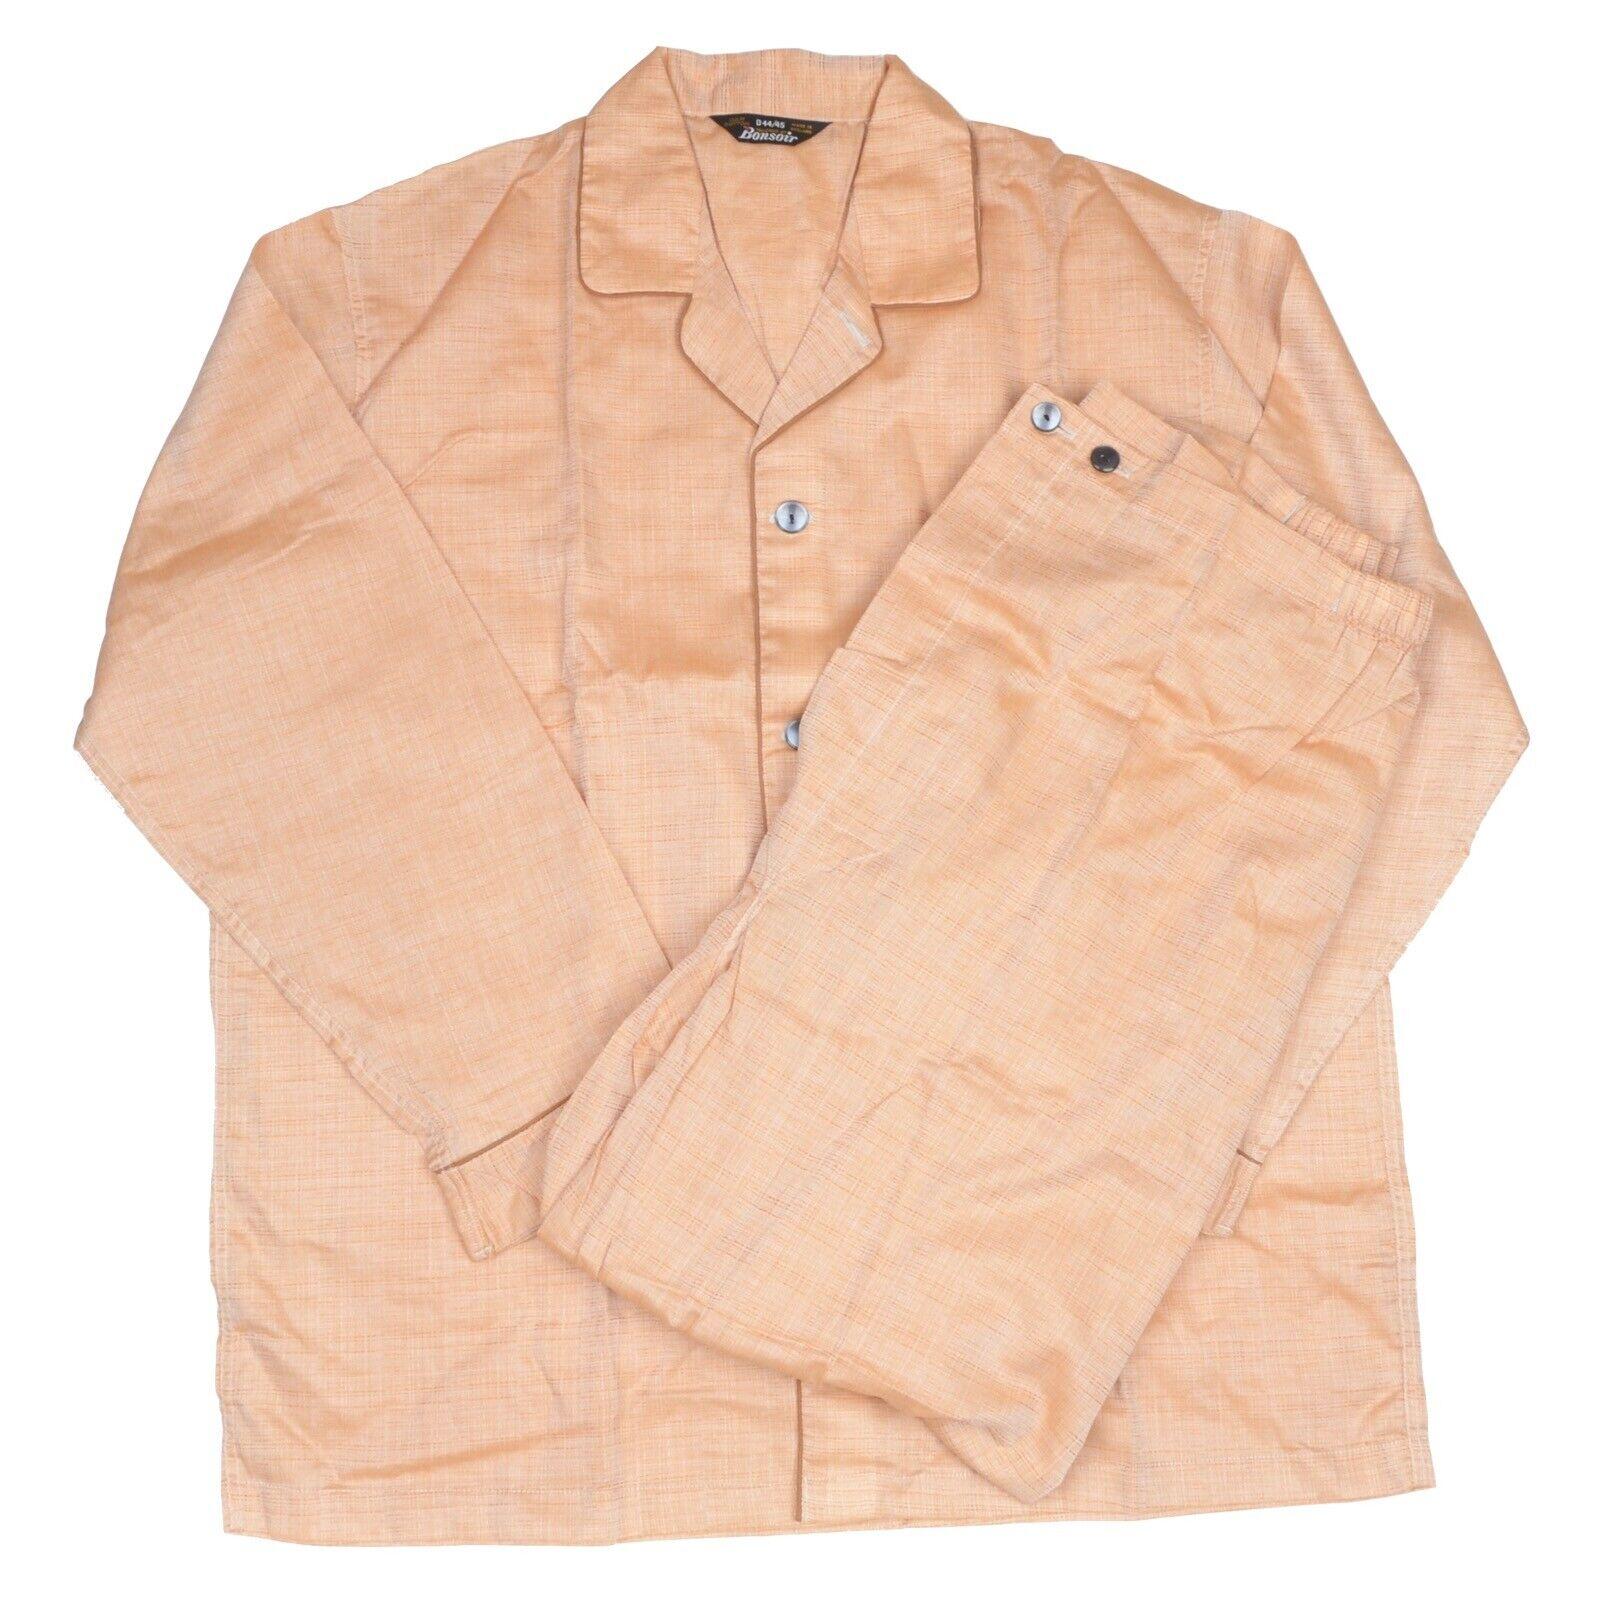 NEU Vintage Bonsoir Pyjamas Gr D44 45 XL Made in England Orange Baumwolle baumwolle